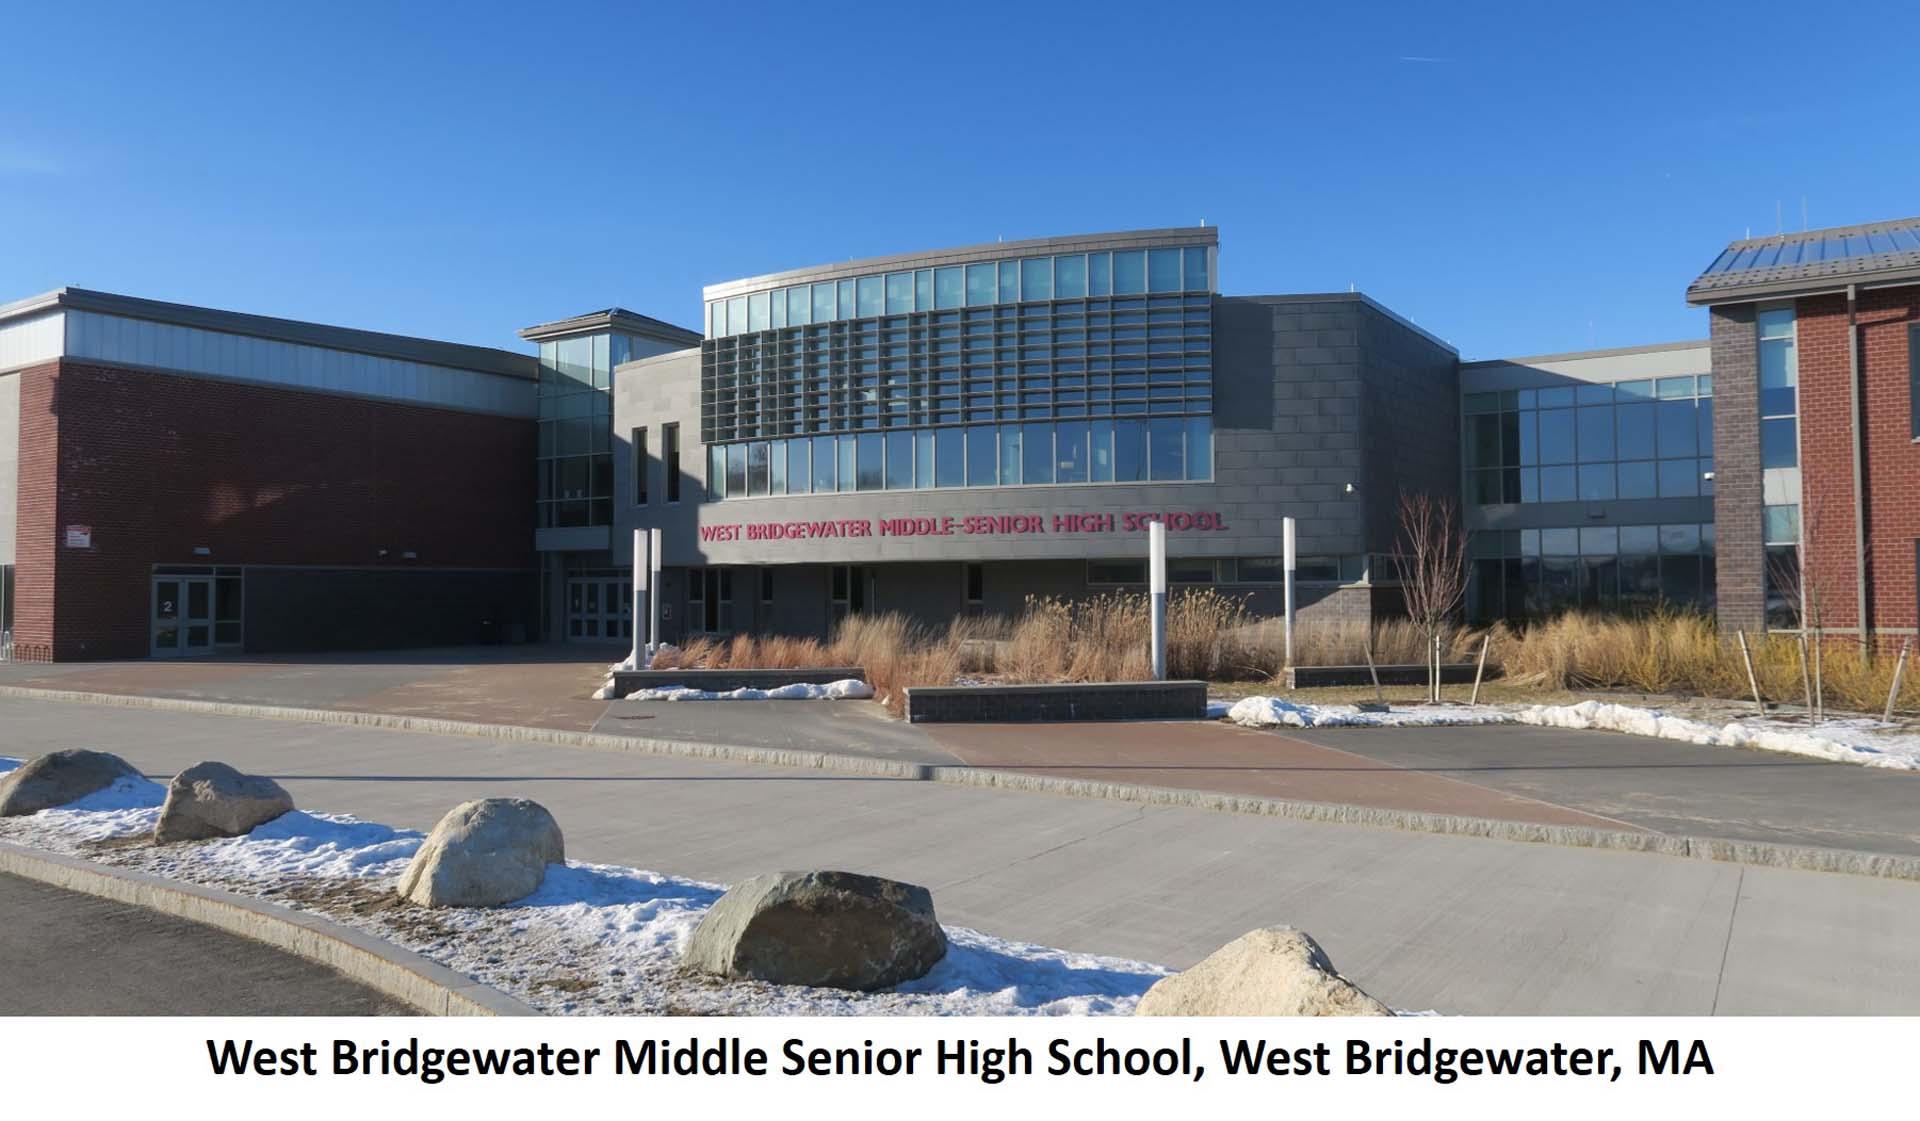 West Bridgewater Middle Senior High School West Bridgewater MA